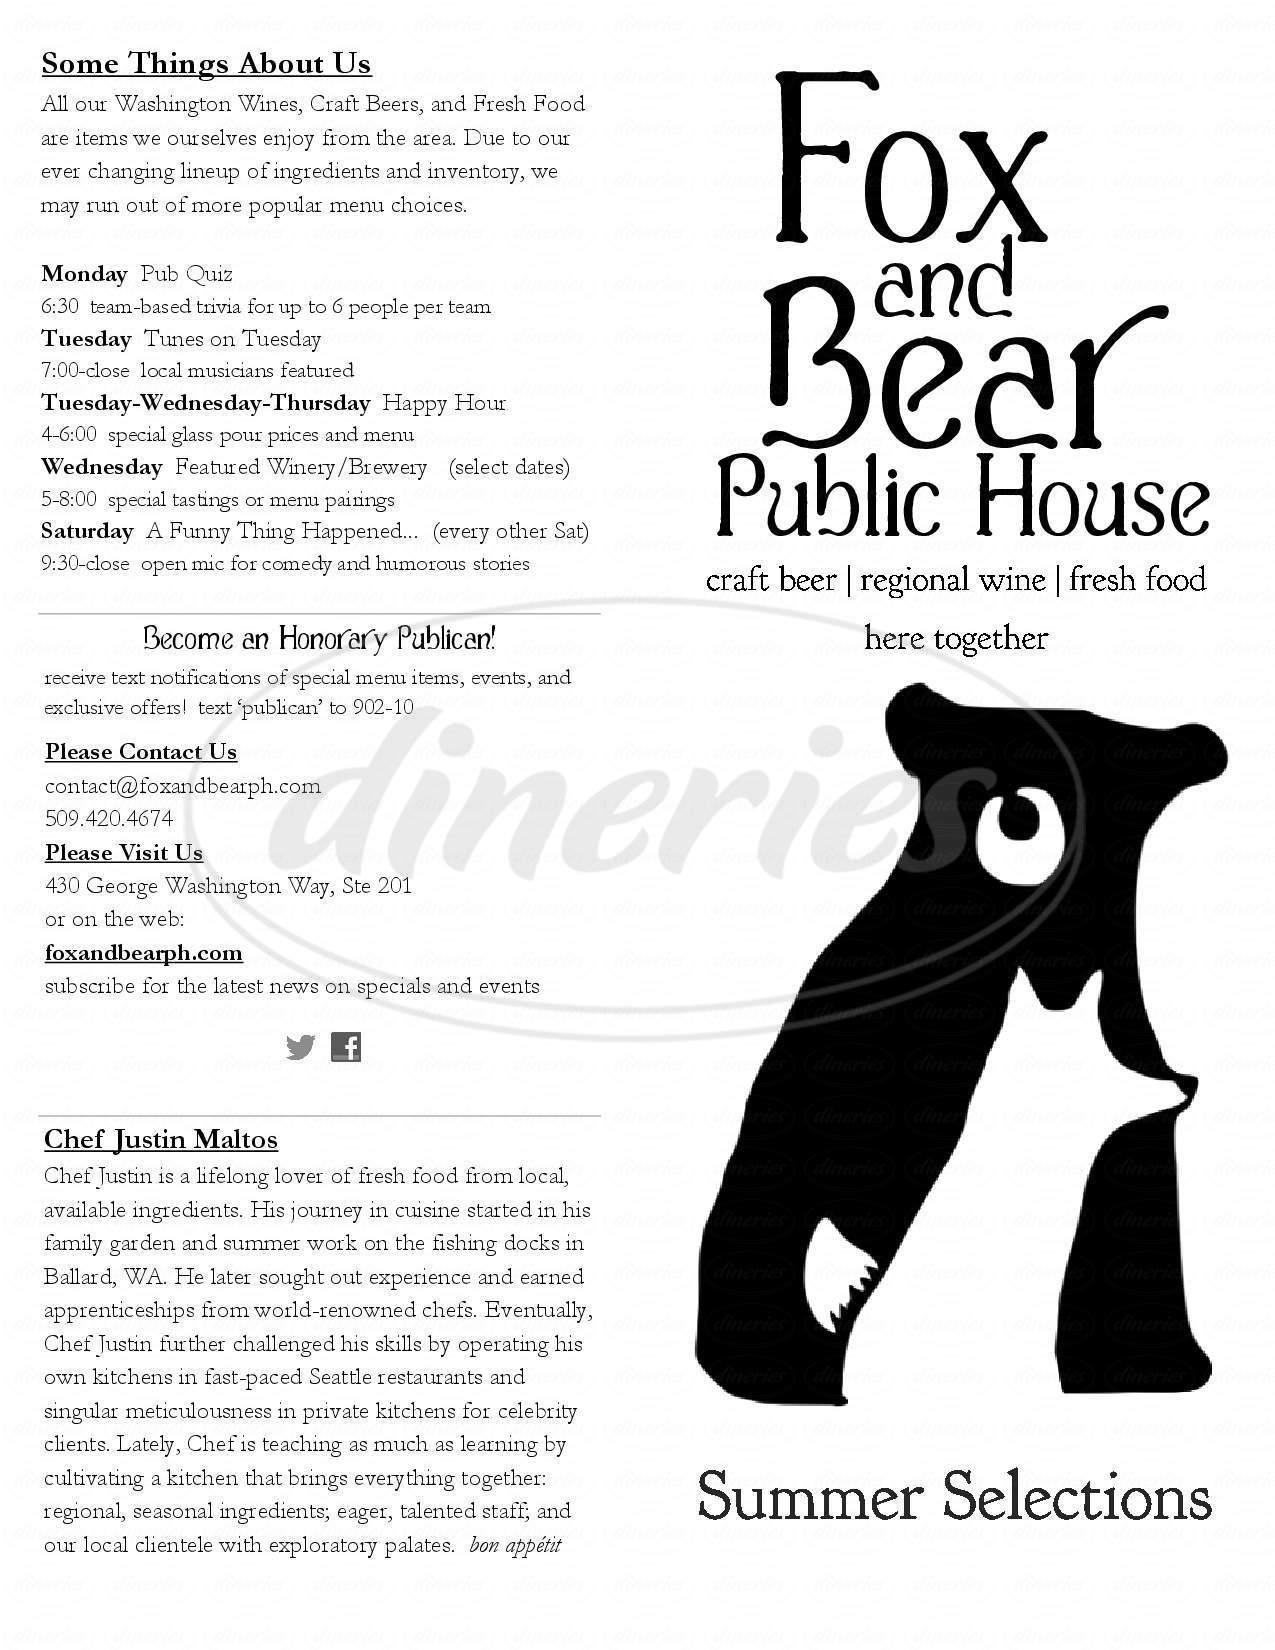 menu for Fox and Bear Public House